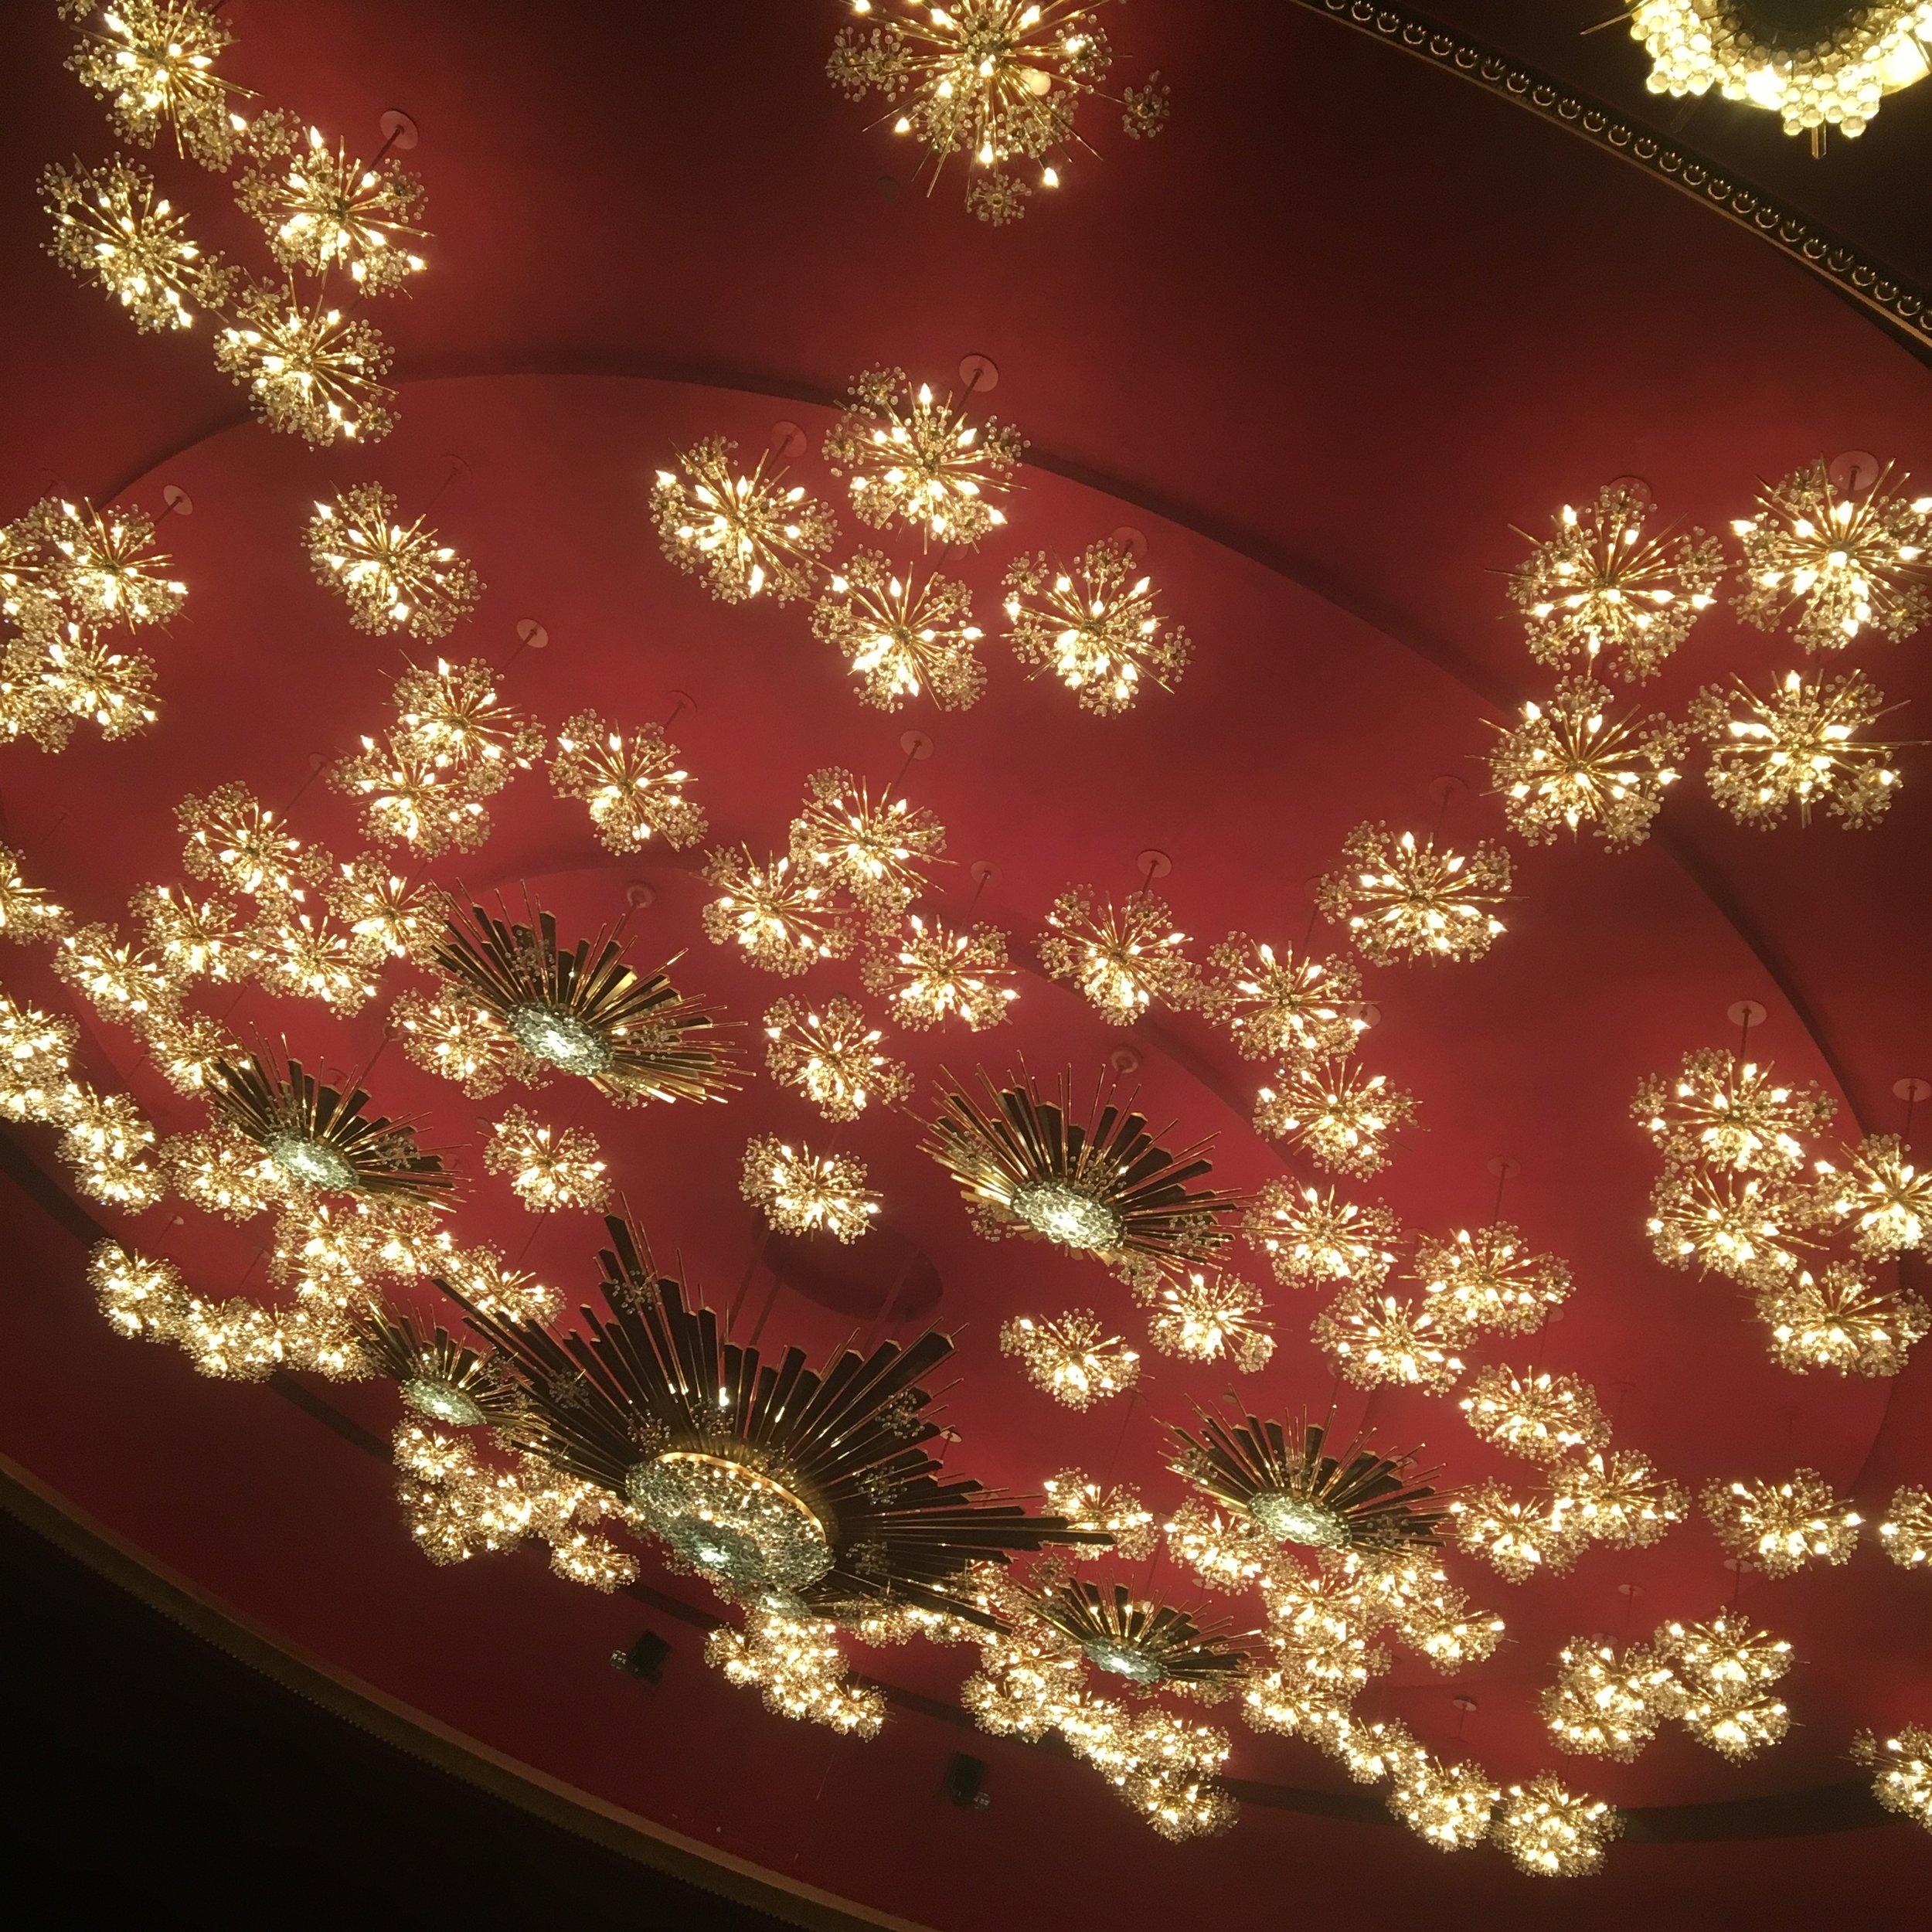 The Kennedy Center Opera House